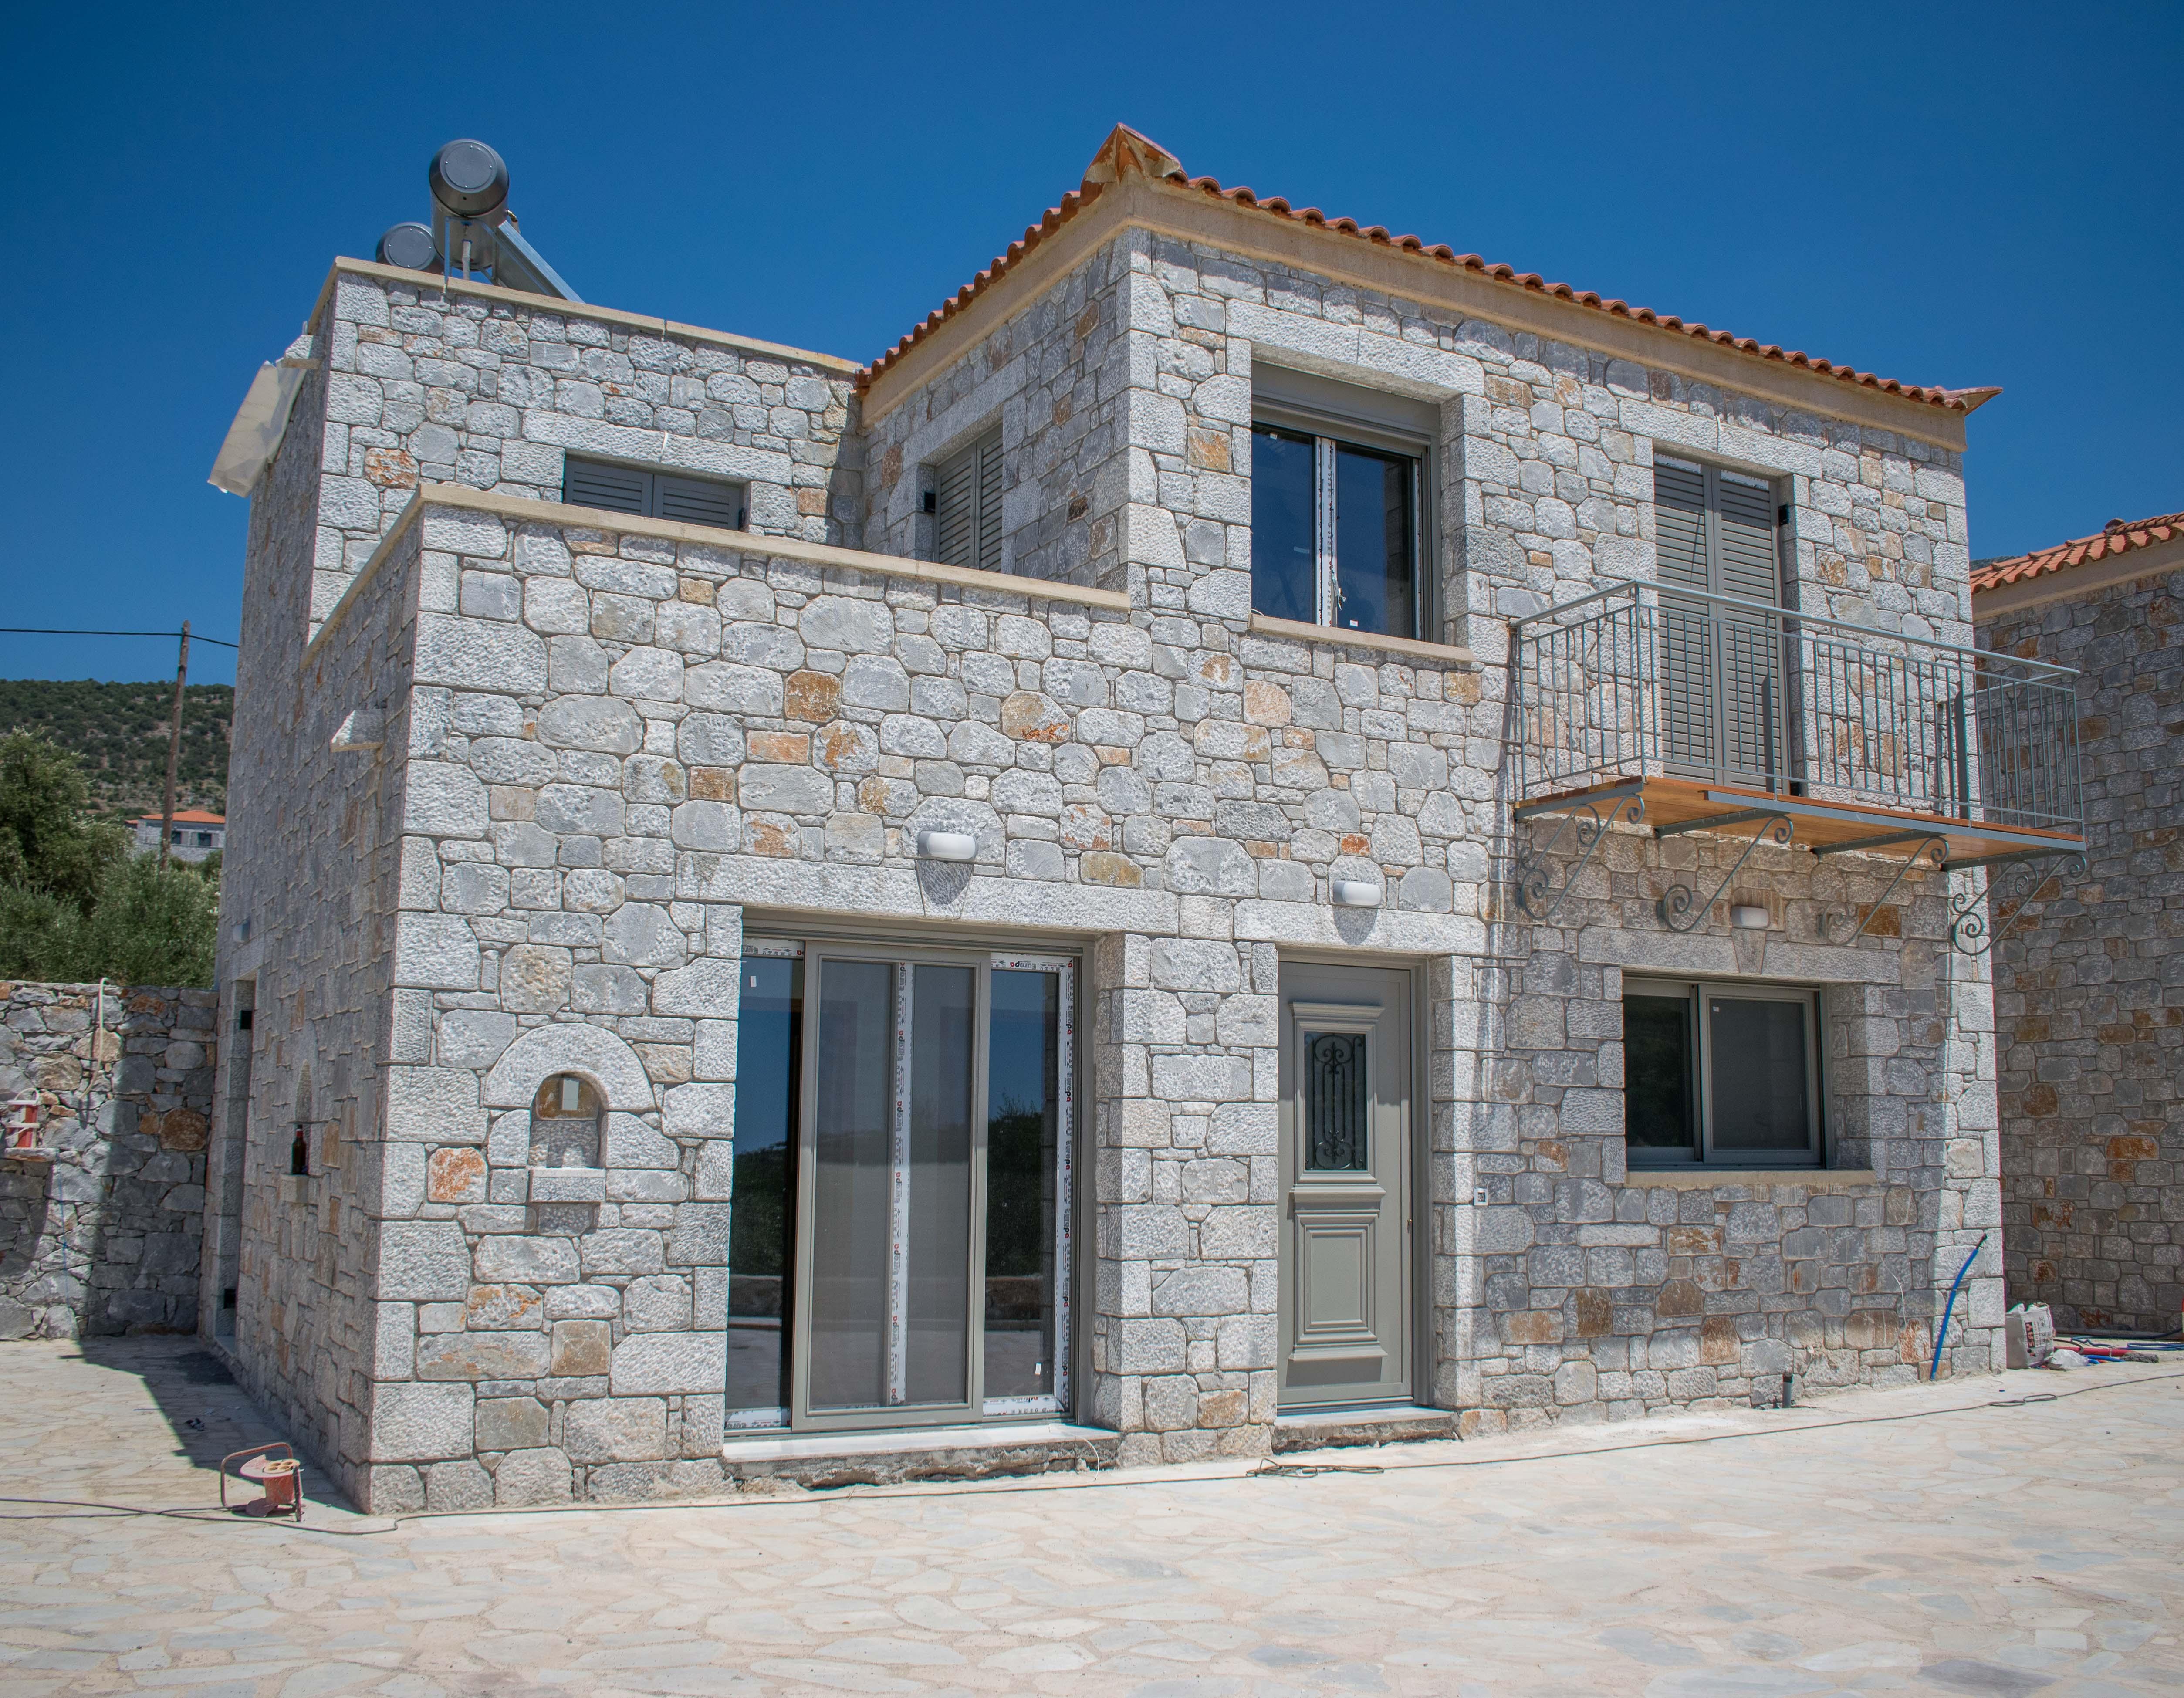 Lägenhet – SRE1143071 – Lefktro-Kardamyli – Agios Dimitrios